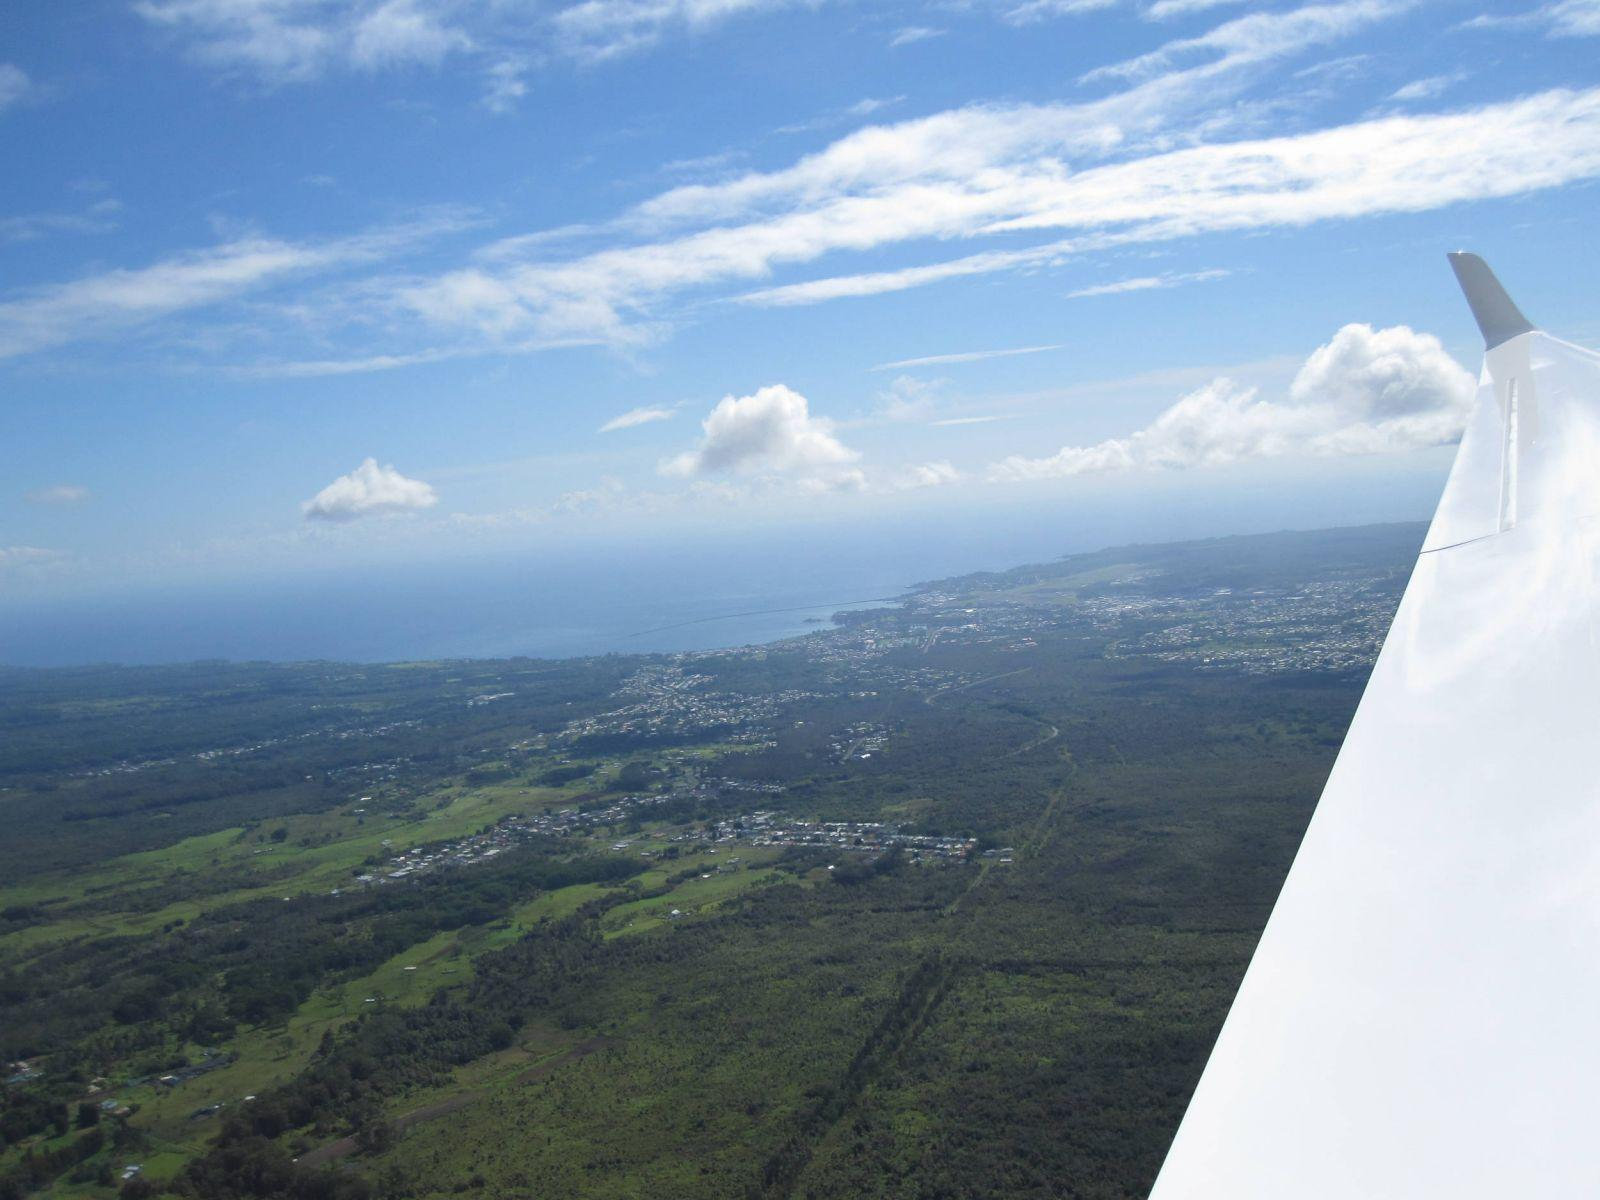 View of Hilo Town and the coastline Hawaii Island